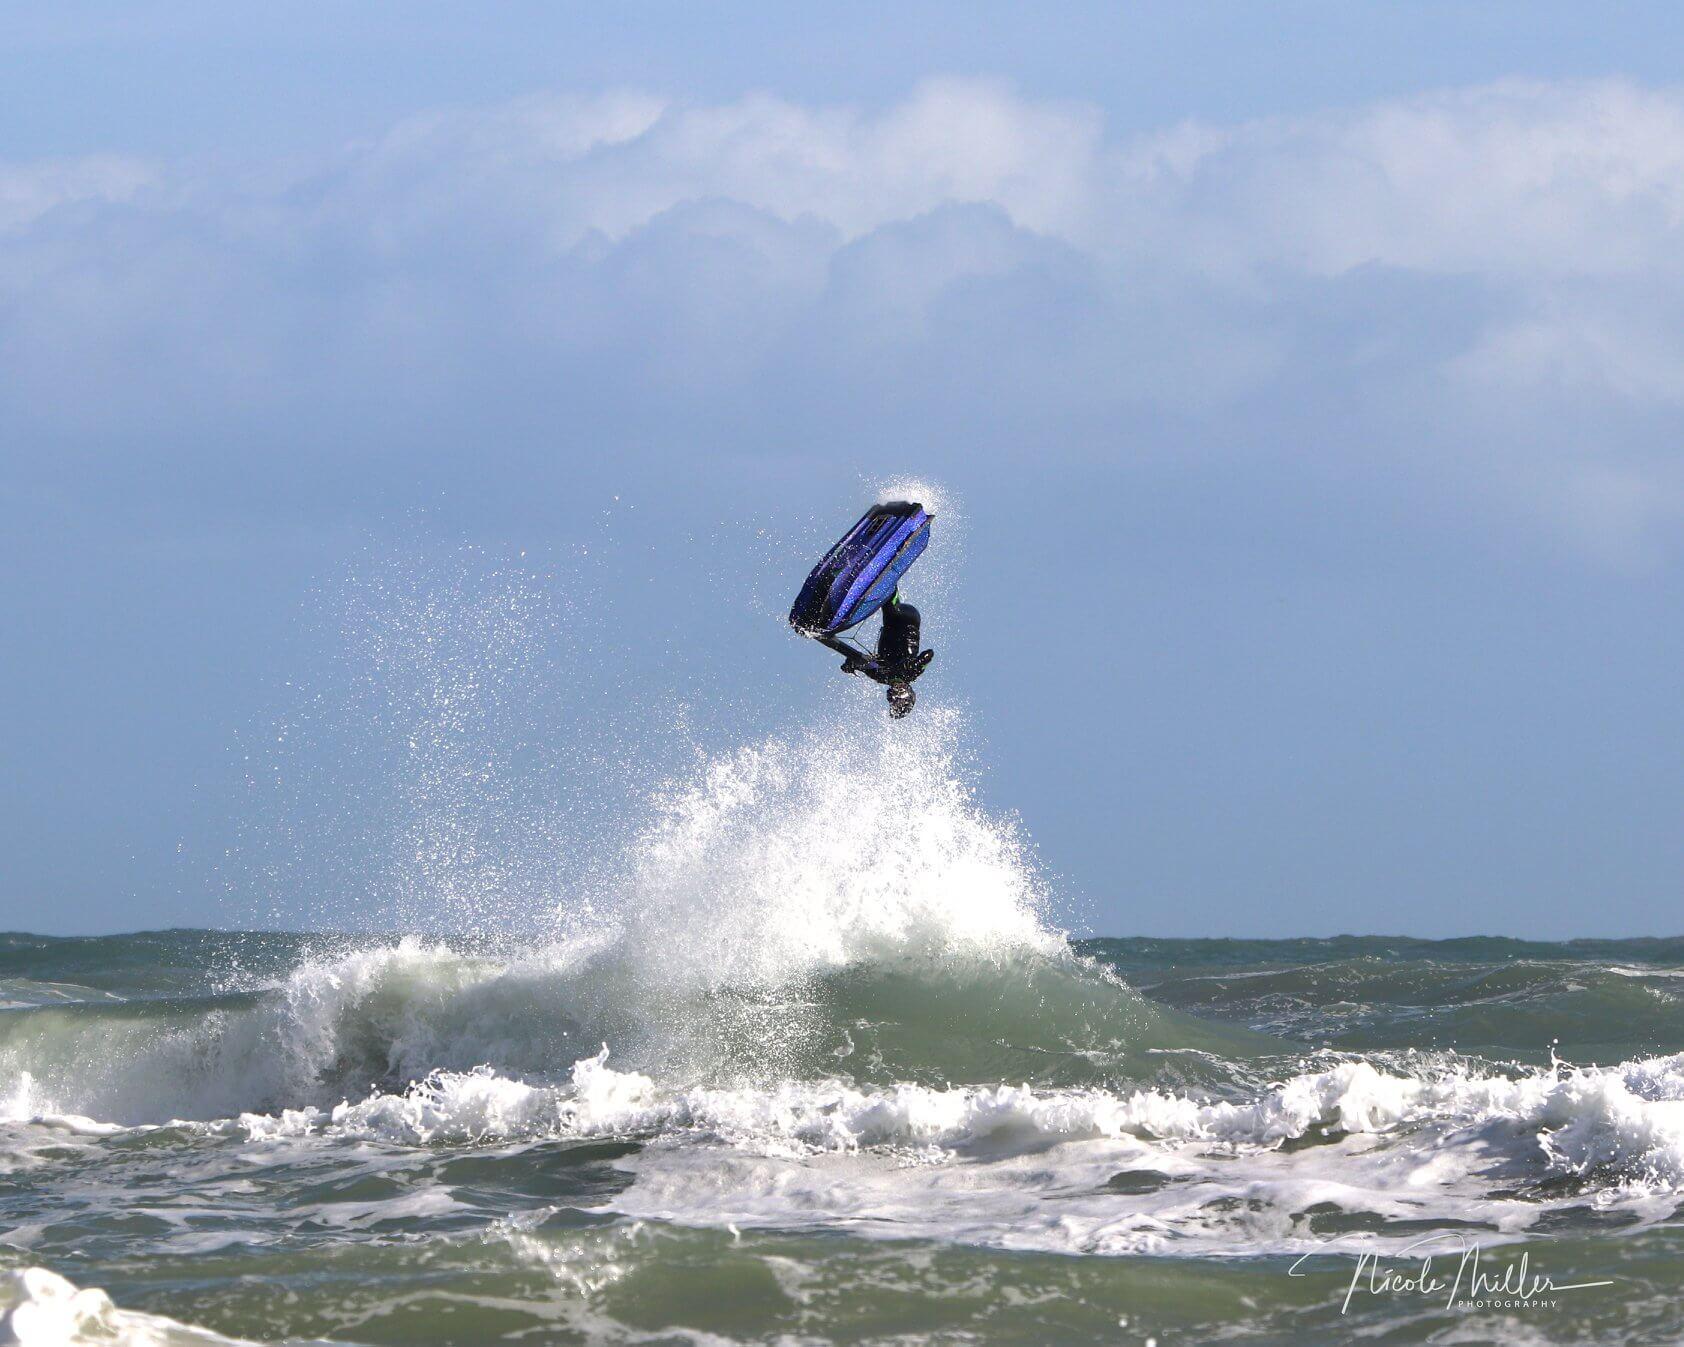 Daytona Freeride Jet Ski Event – Past Event Pictures